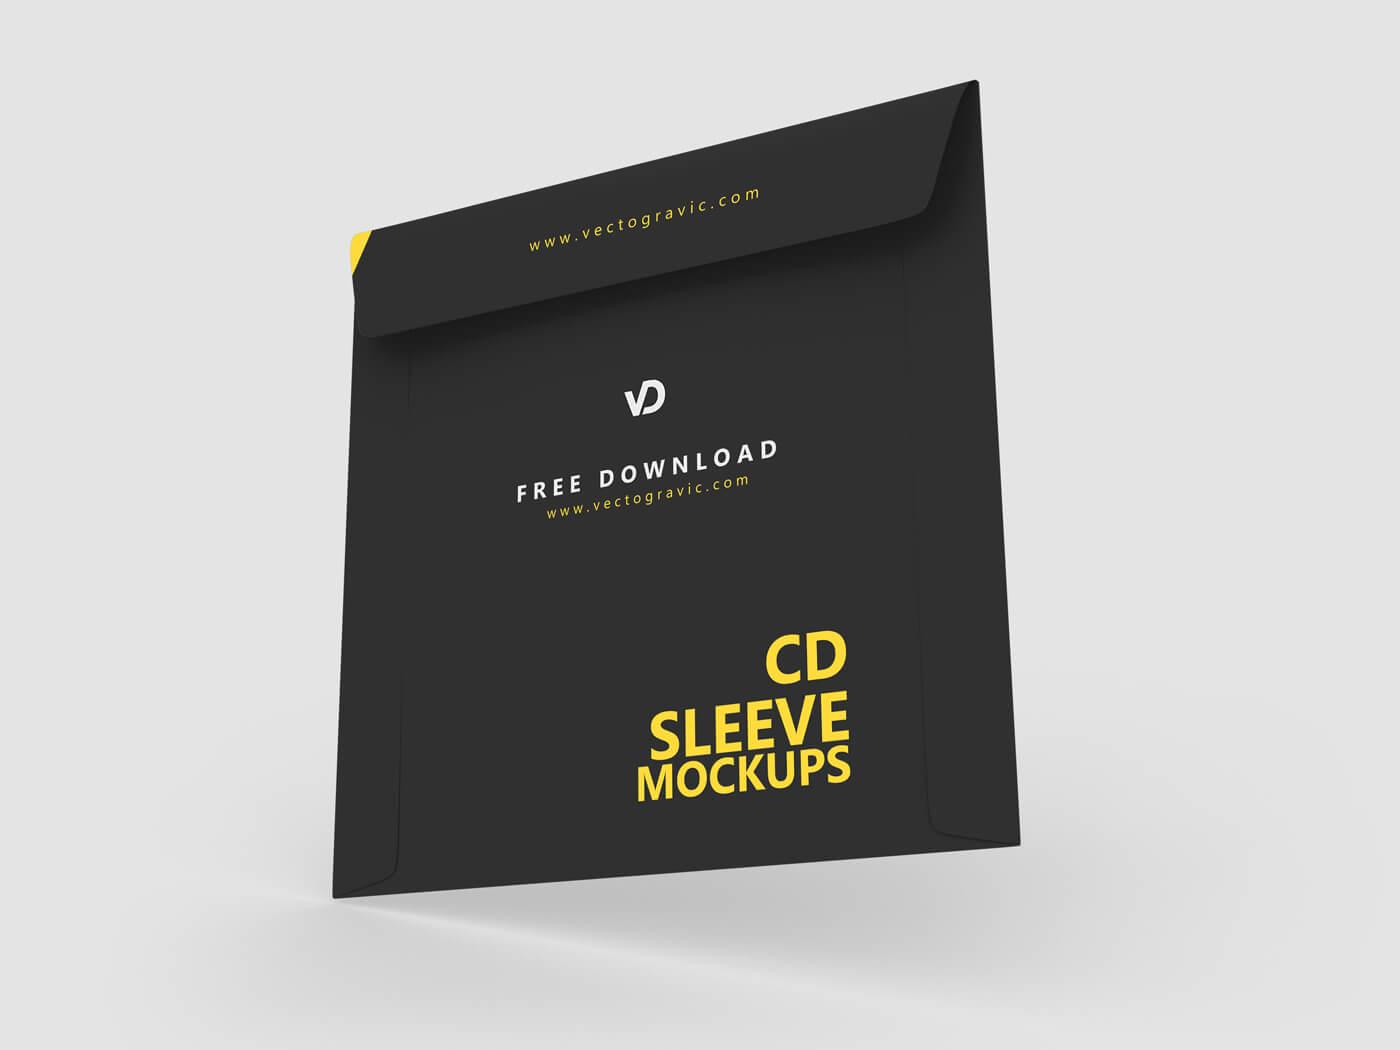 CD Sleeve Mockup 03